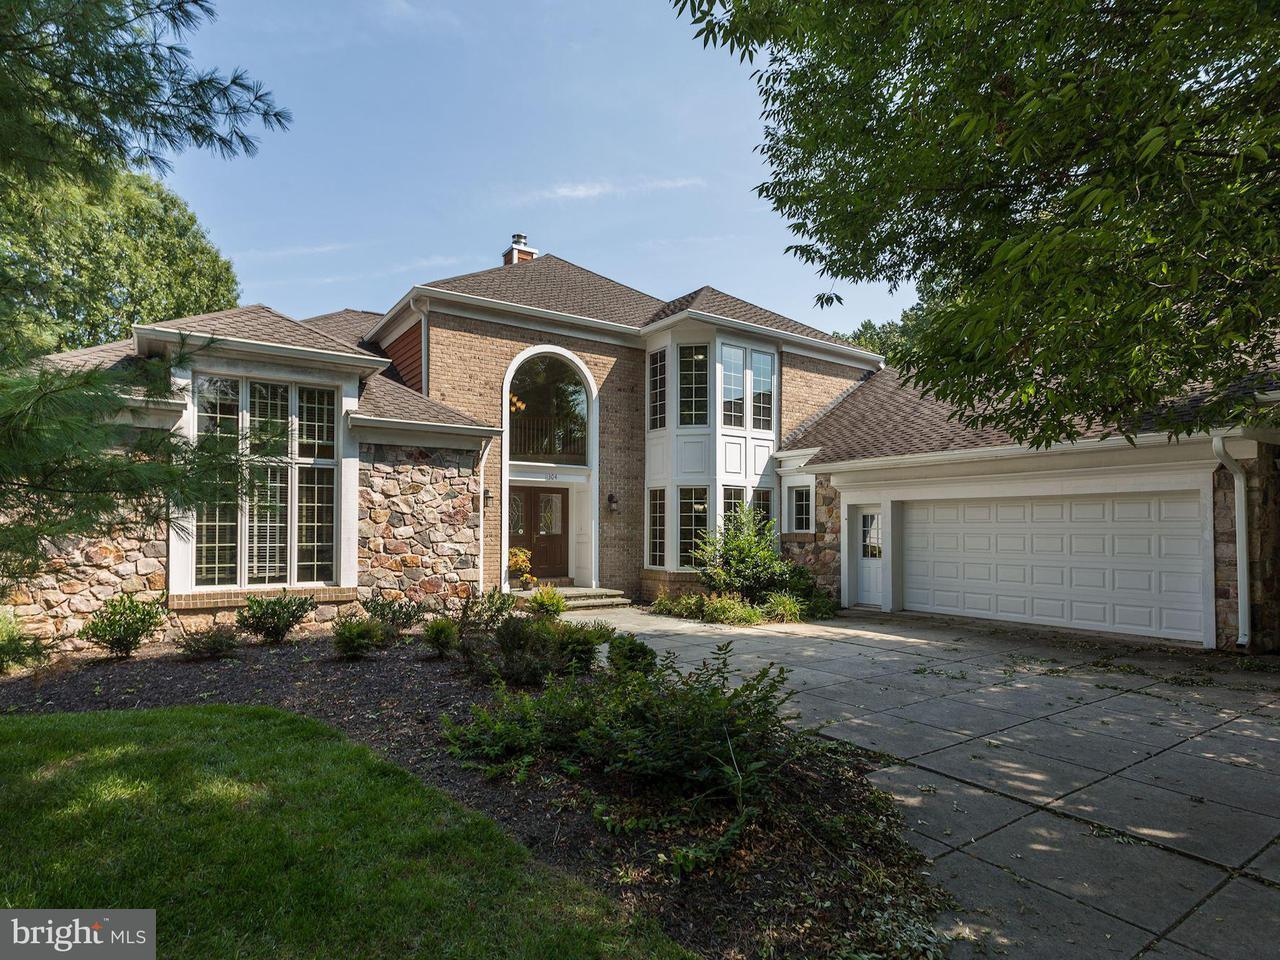 Single Family Home for Sale at 11304 Ridermark Row 11304 Ridermark Row Columbia, Maryland 21044 United States